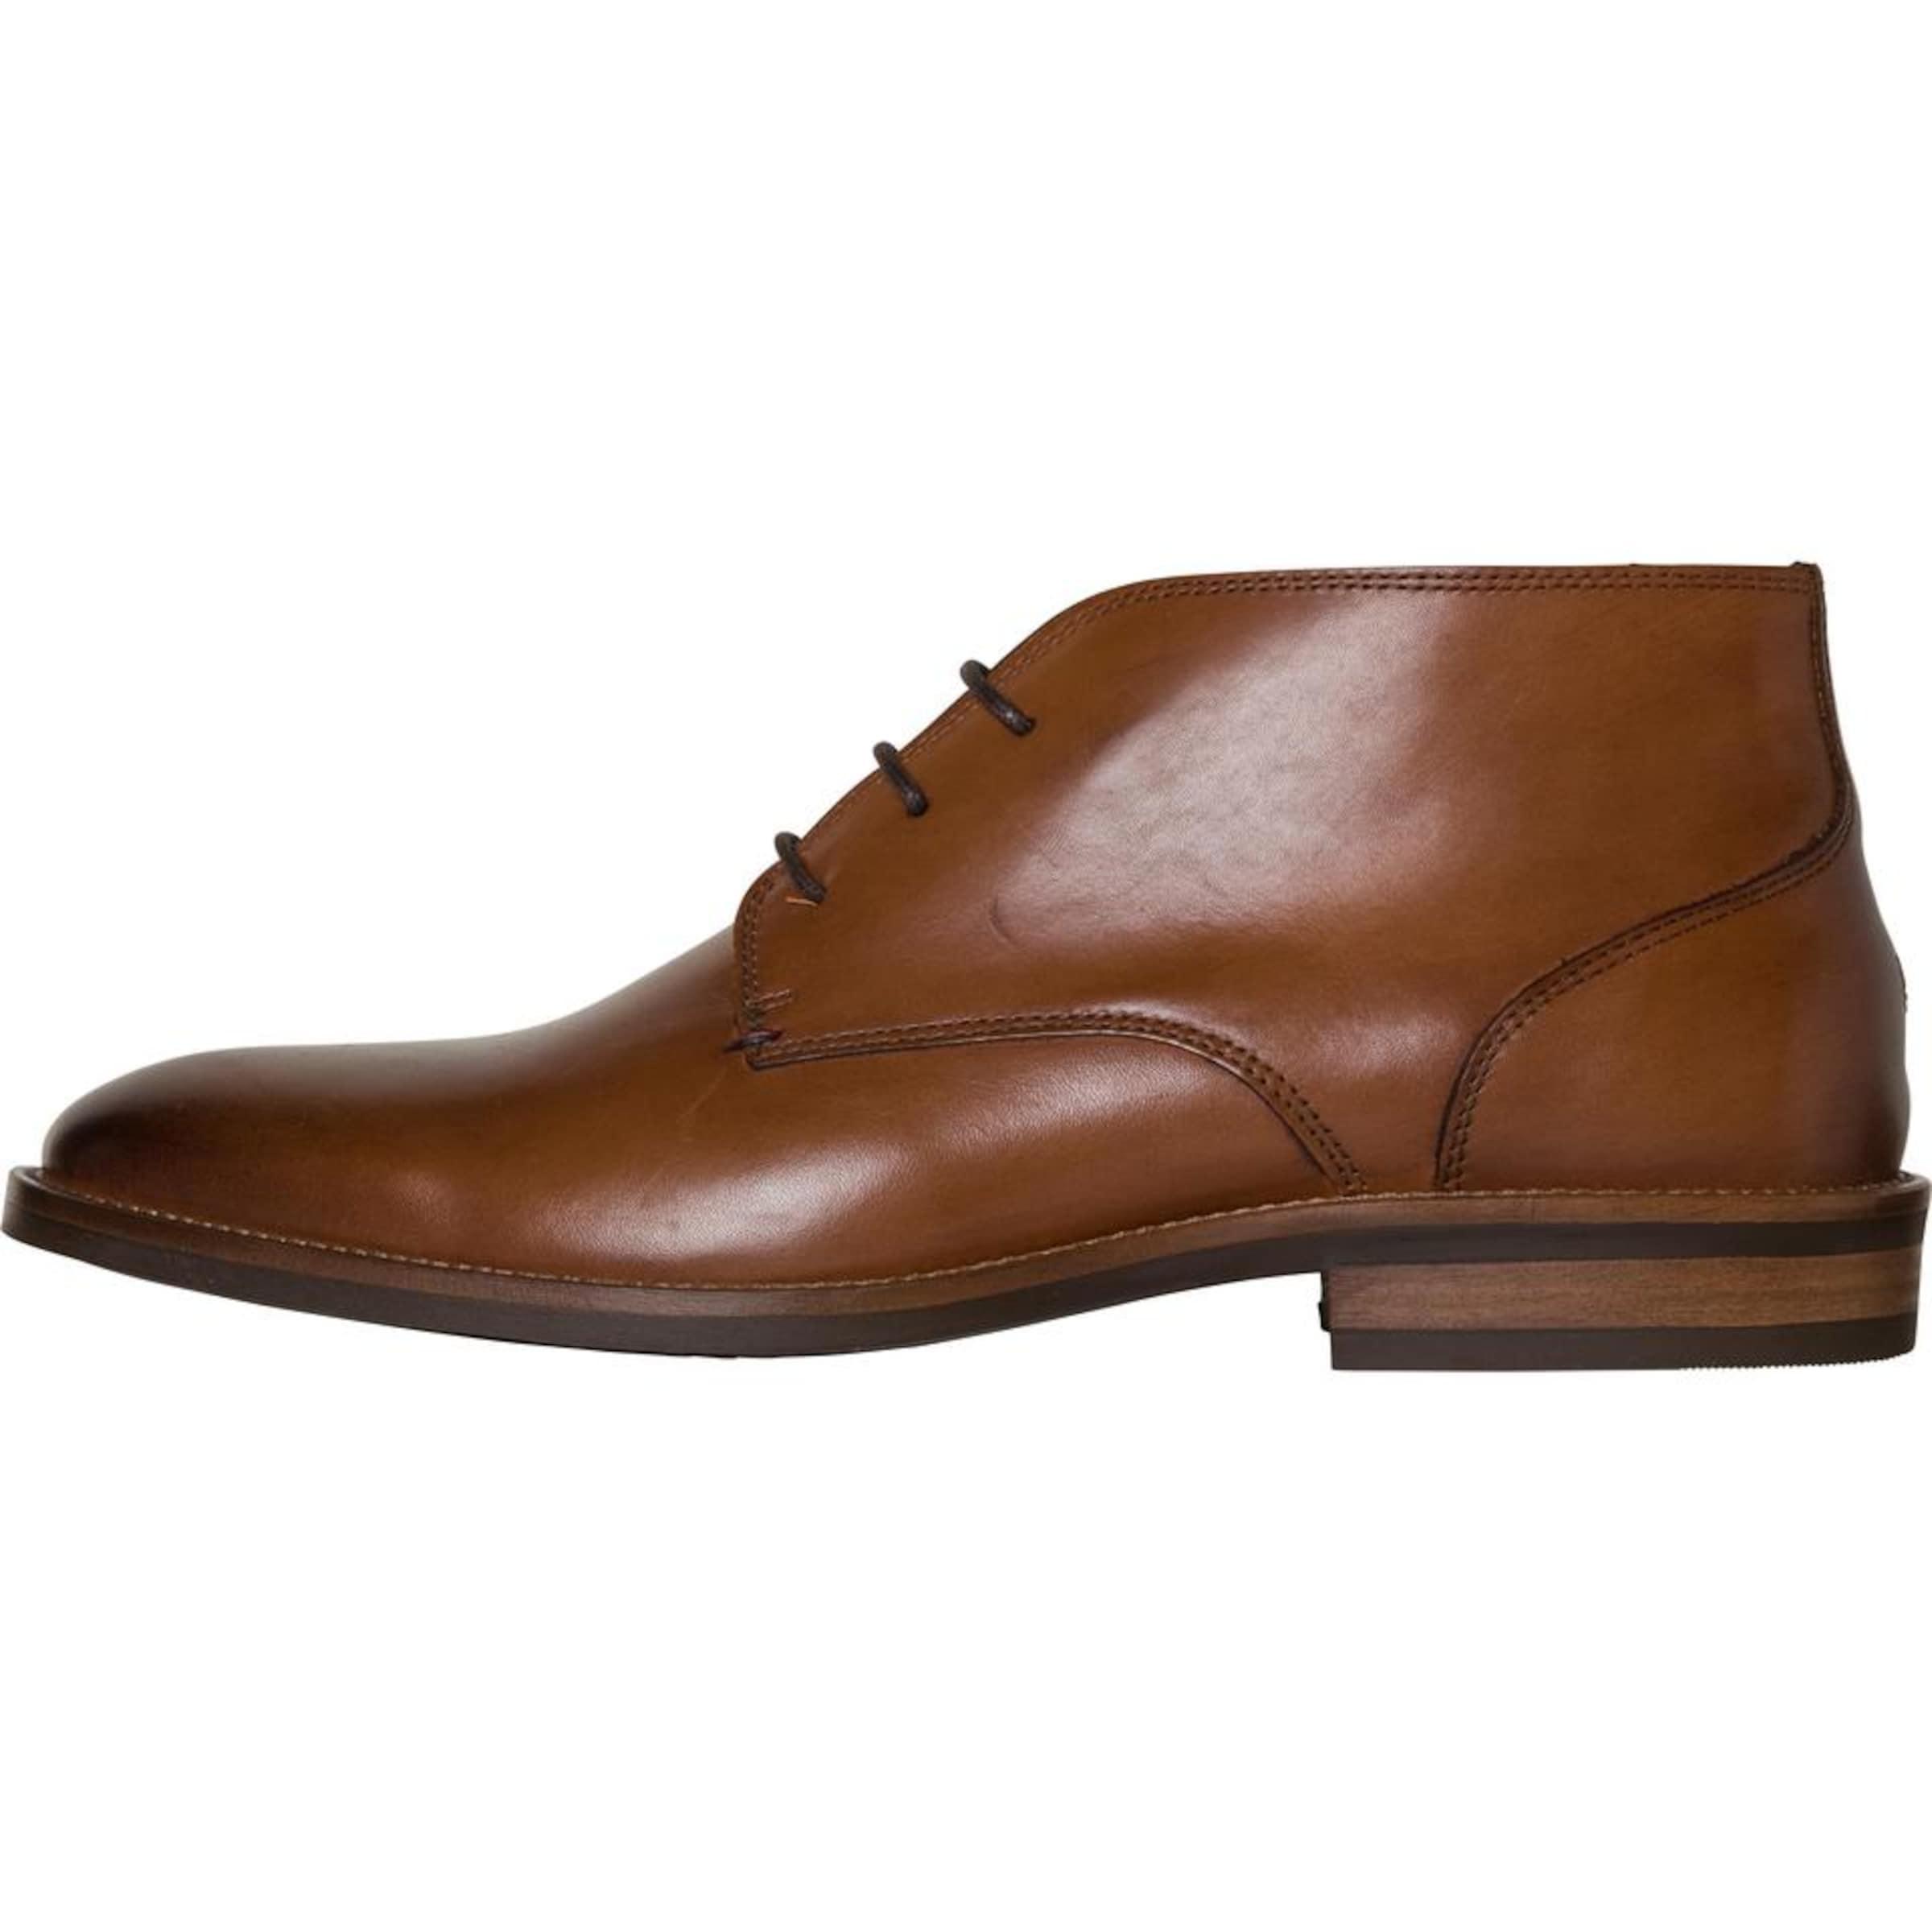 TOMMY HILFIGER   Schnürhalbschuh 'ESSENTIAL LEATHER Schuhe BOOT' Schuhe Gut getragene Schuhe LEATHER 9d828b